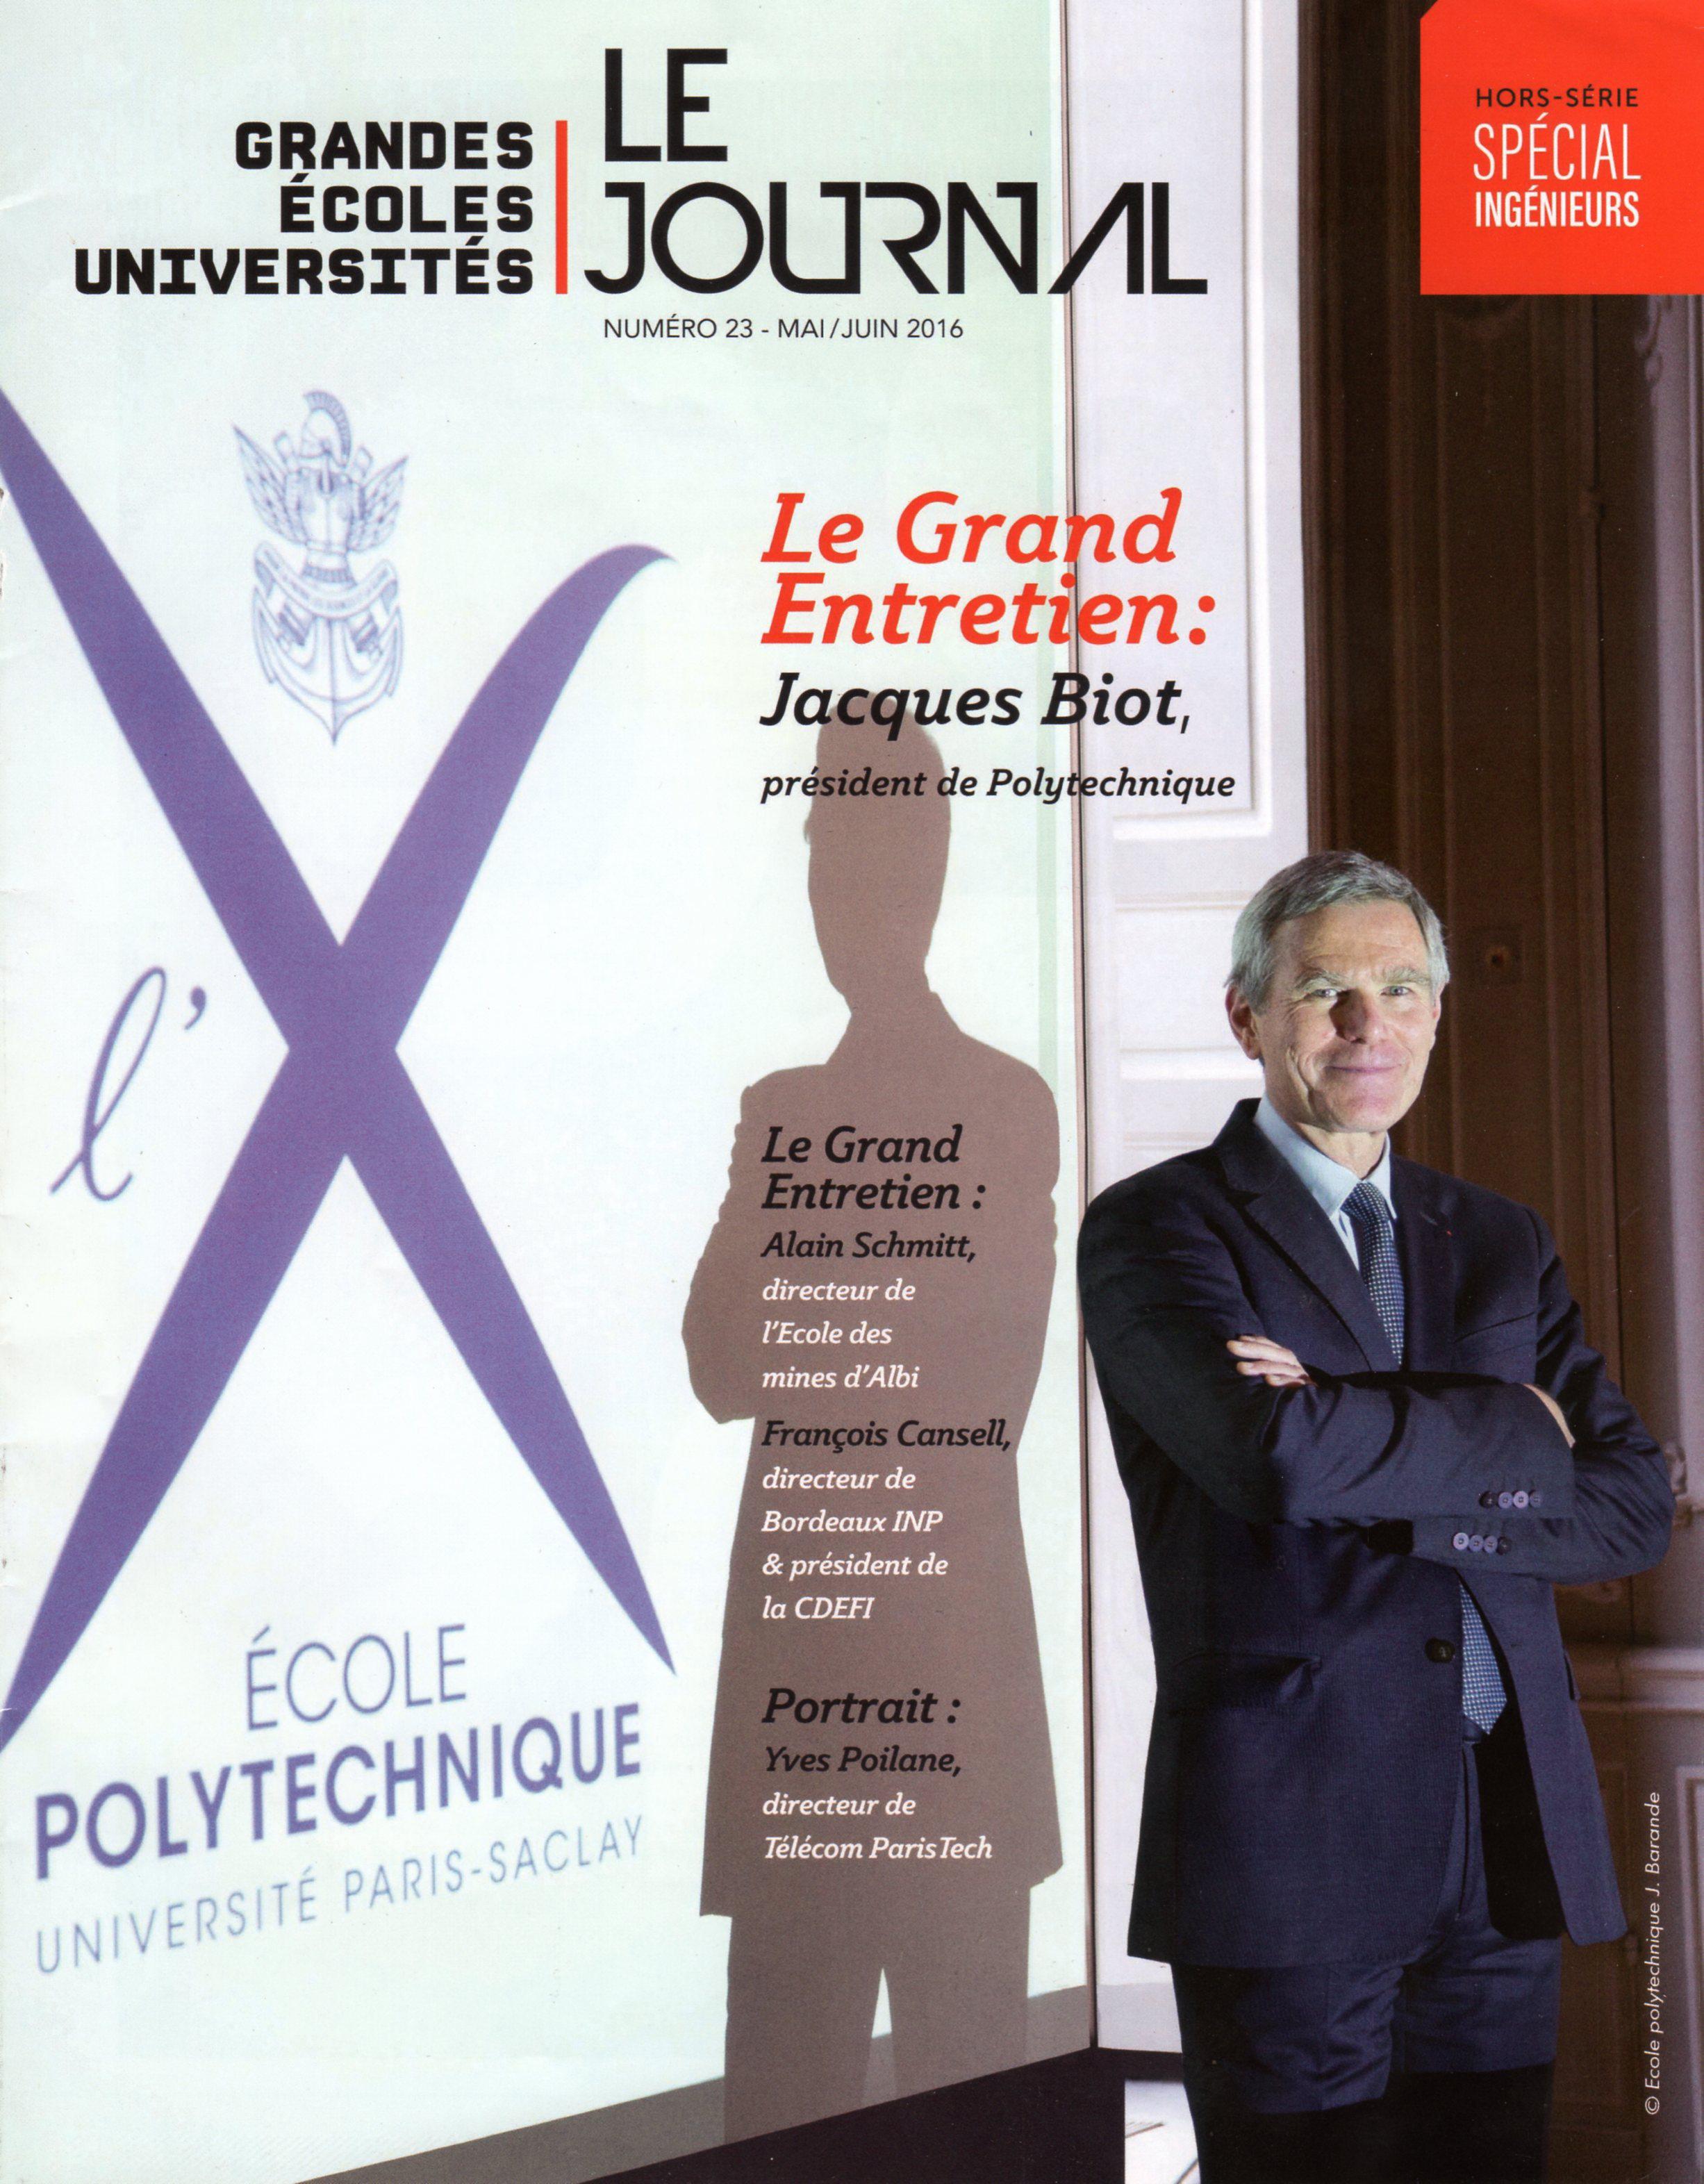 Le Journal 1